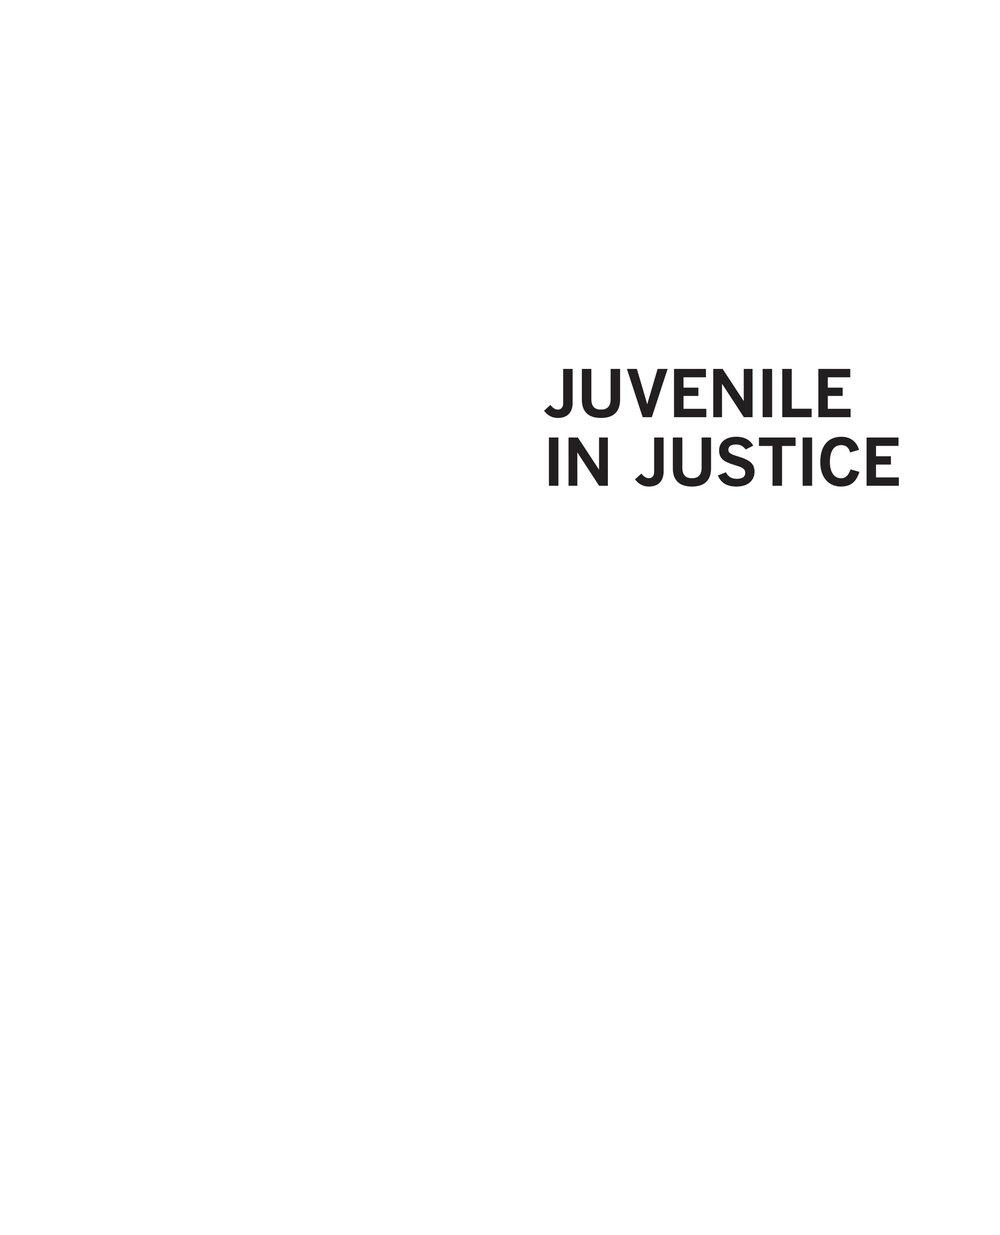 JiJ-Digital_Edition_Page_002_Image_0001.jpg